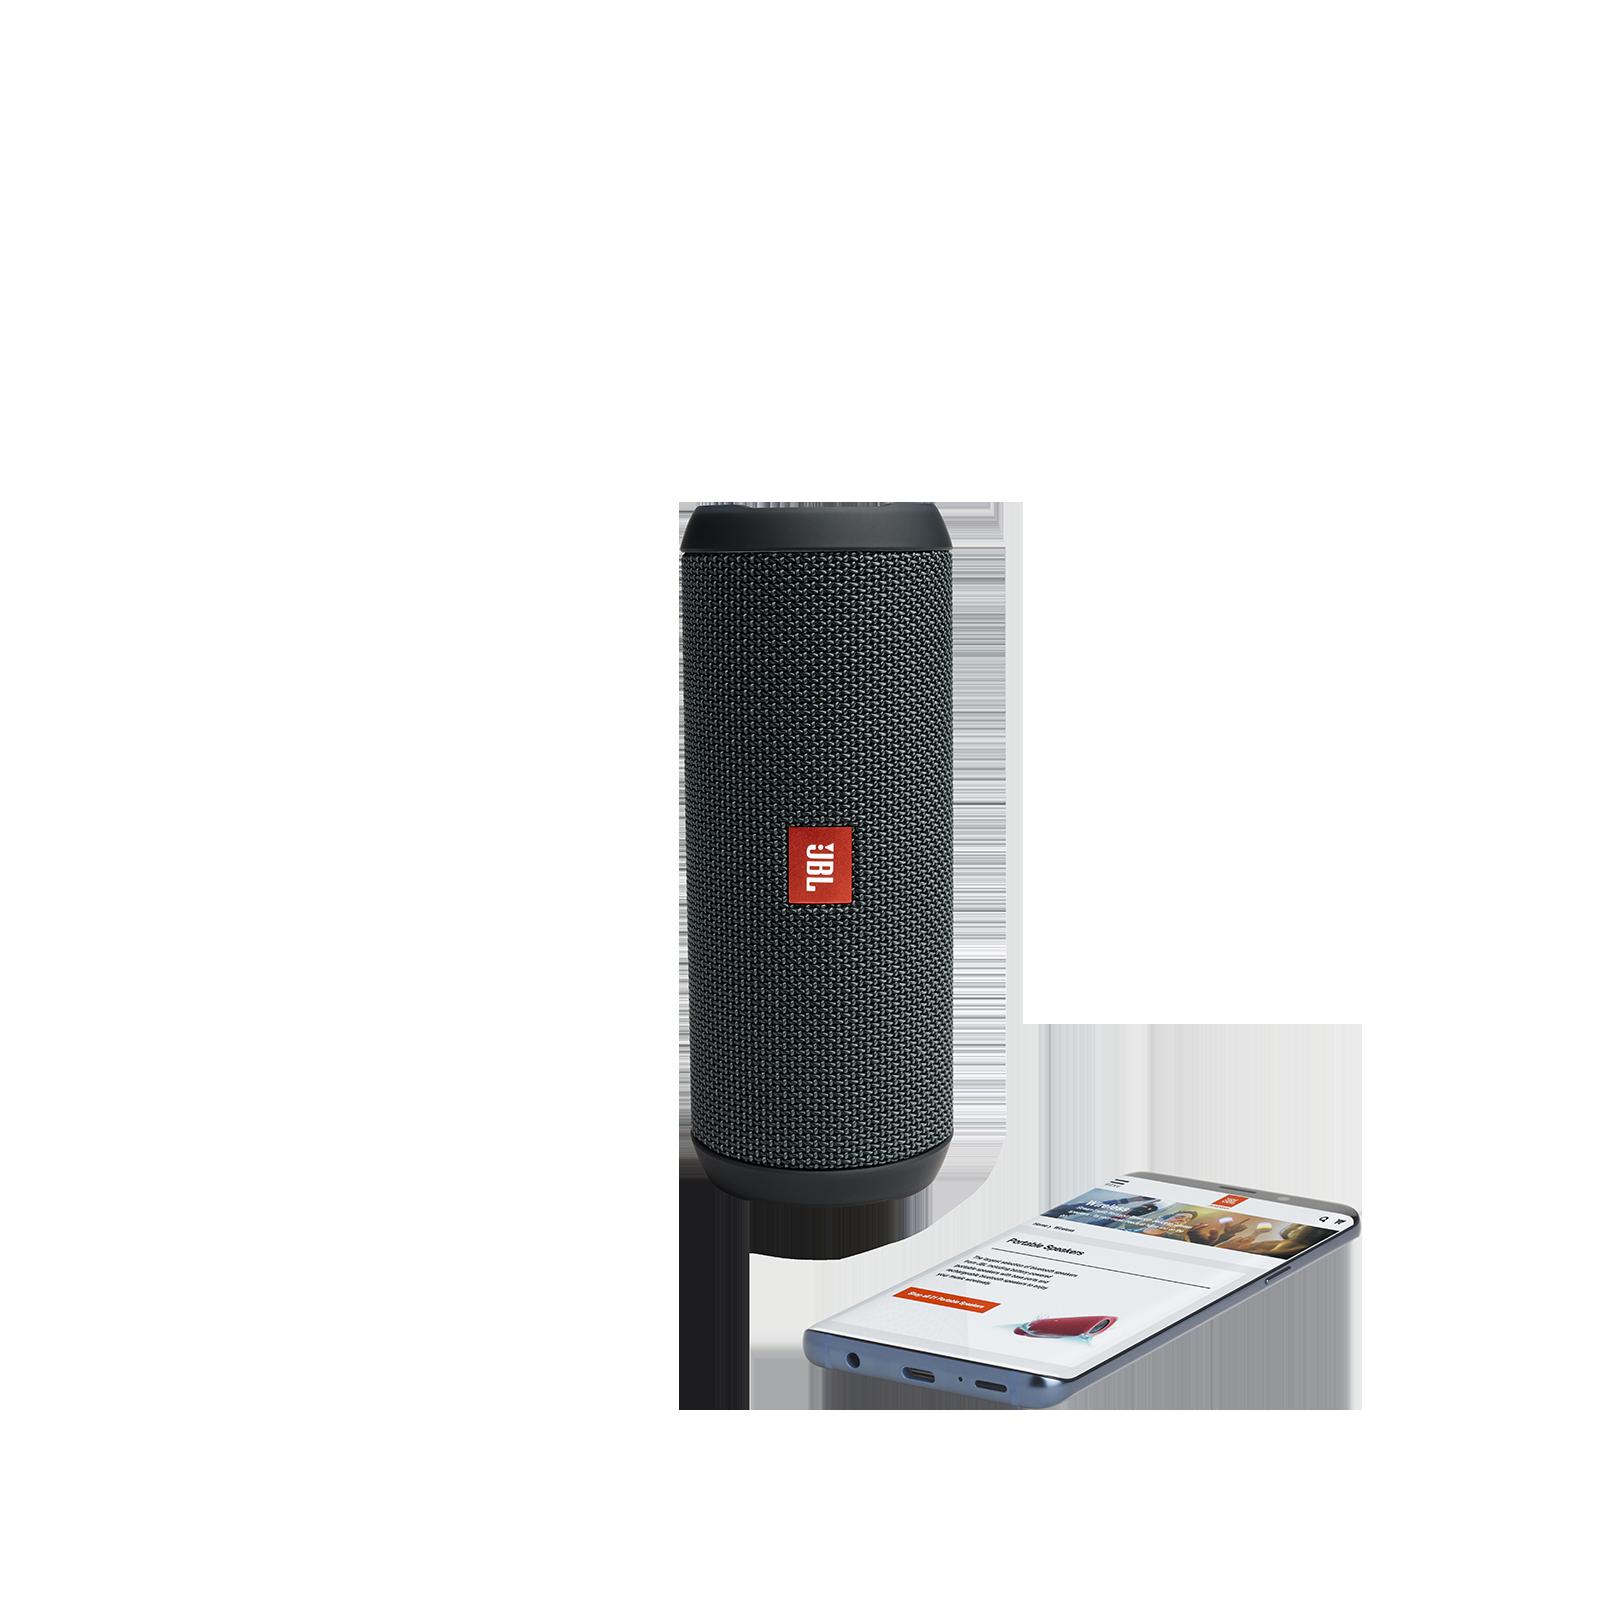 JBL Flip Essential - Gun Metal - Portable Bluetooth® speaker - Detailshot 2